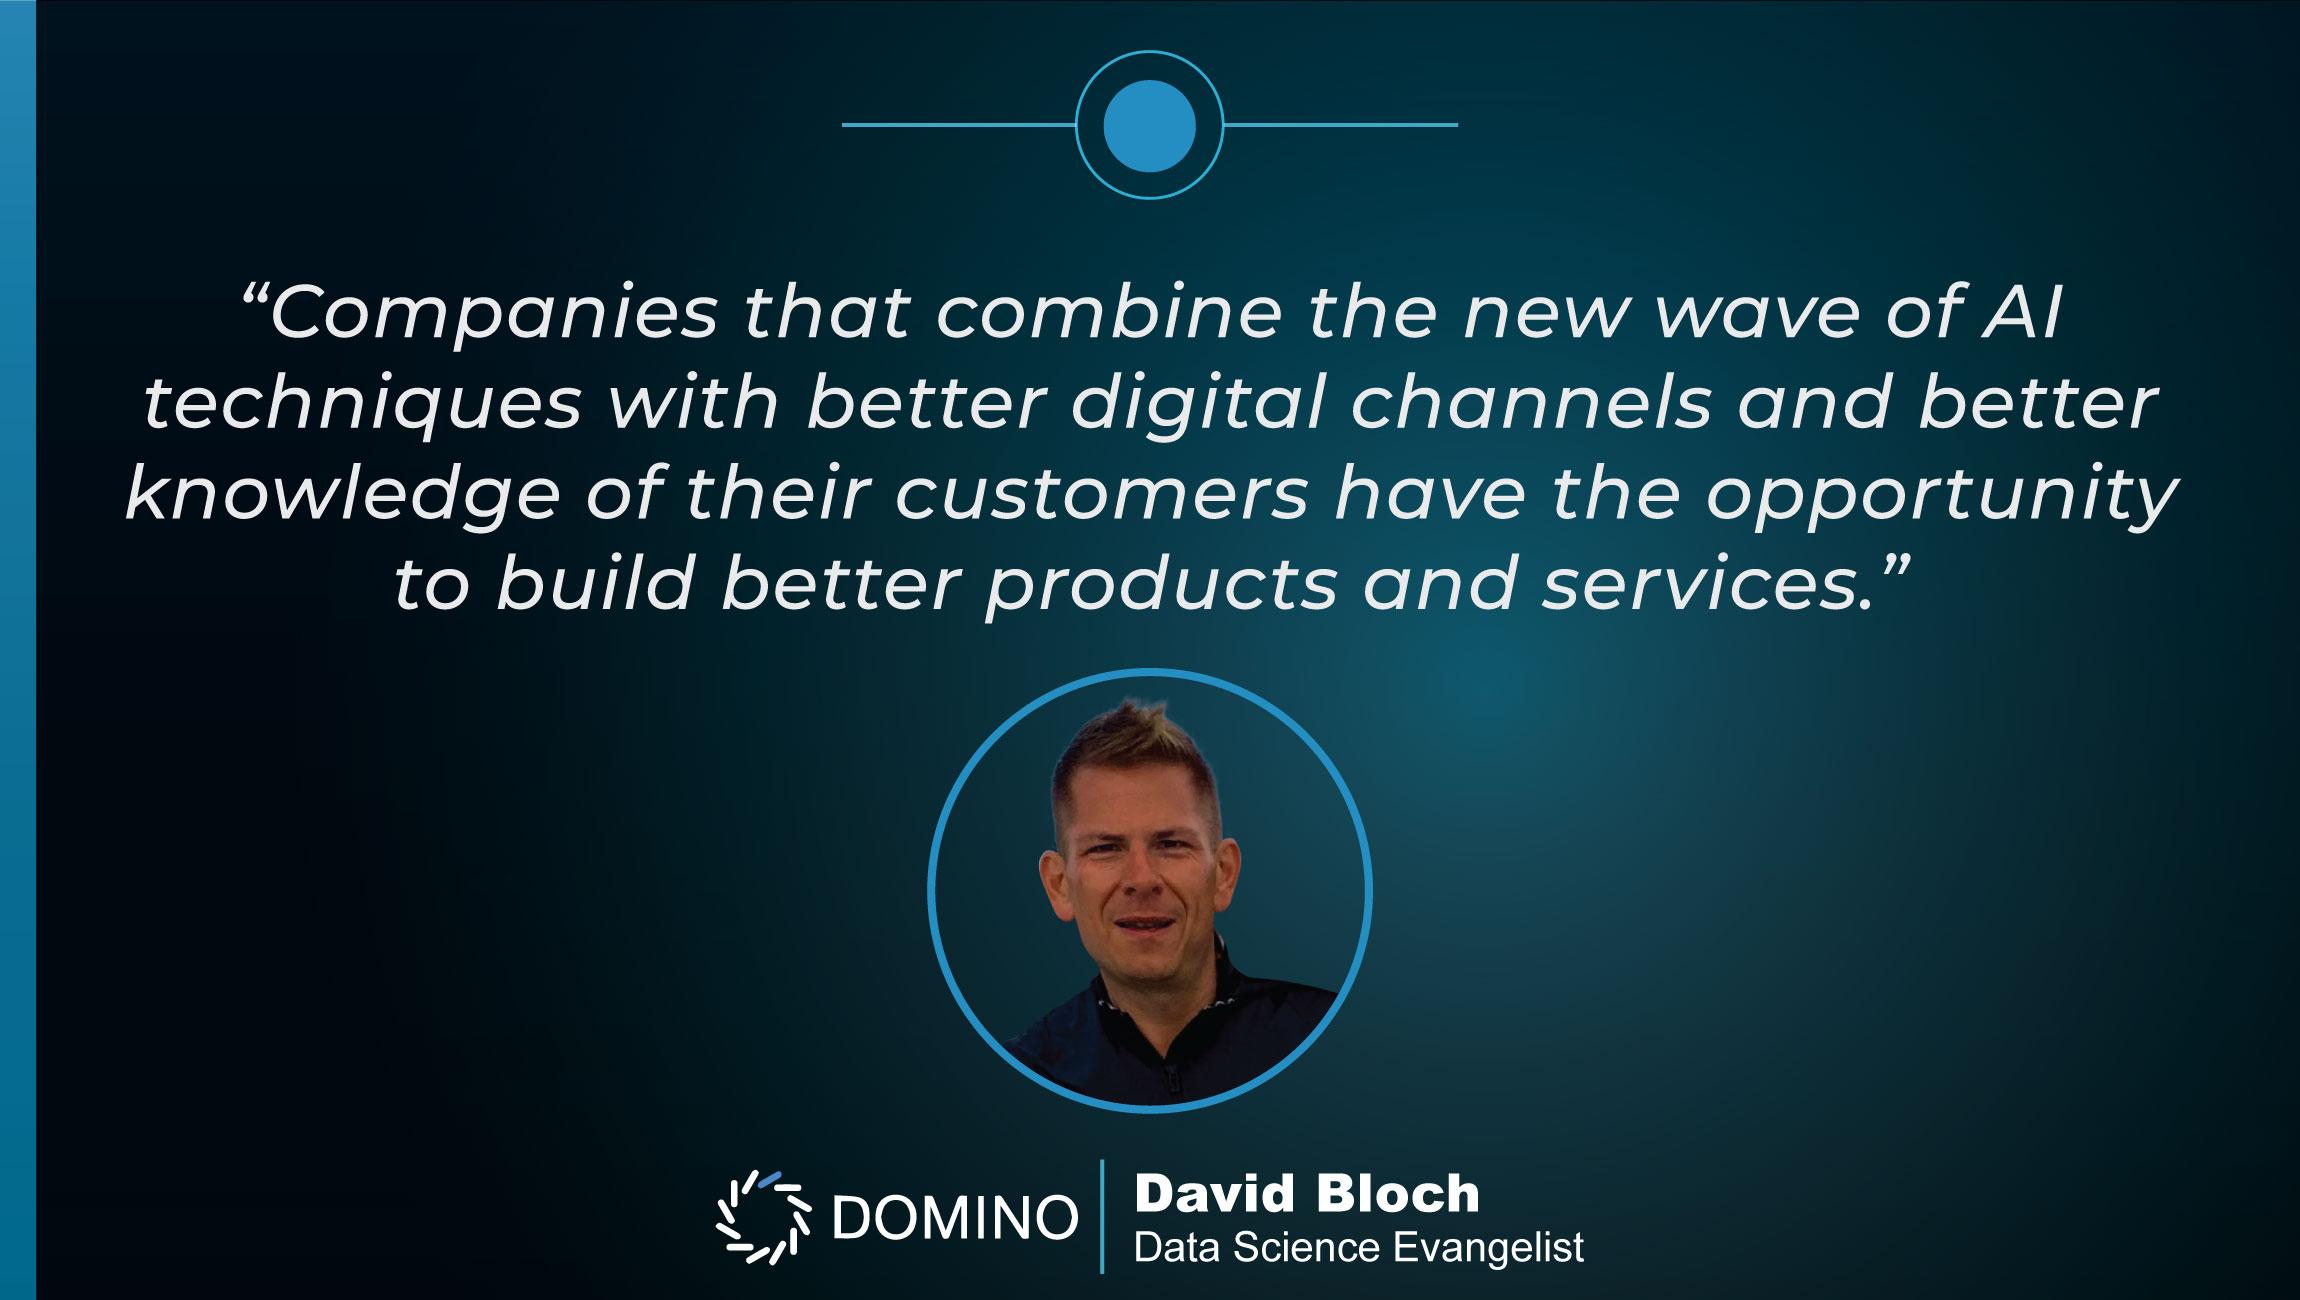 TechBytes with David Bloch, Data Science Evangelist at Domino Data Lab